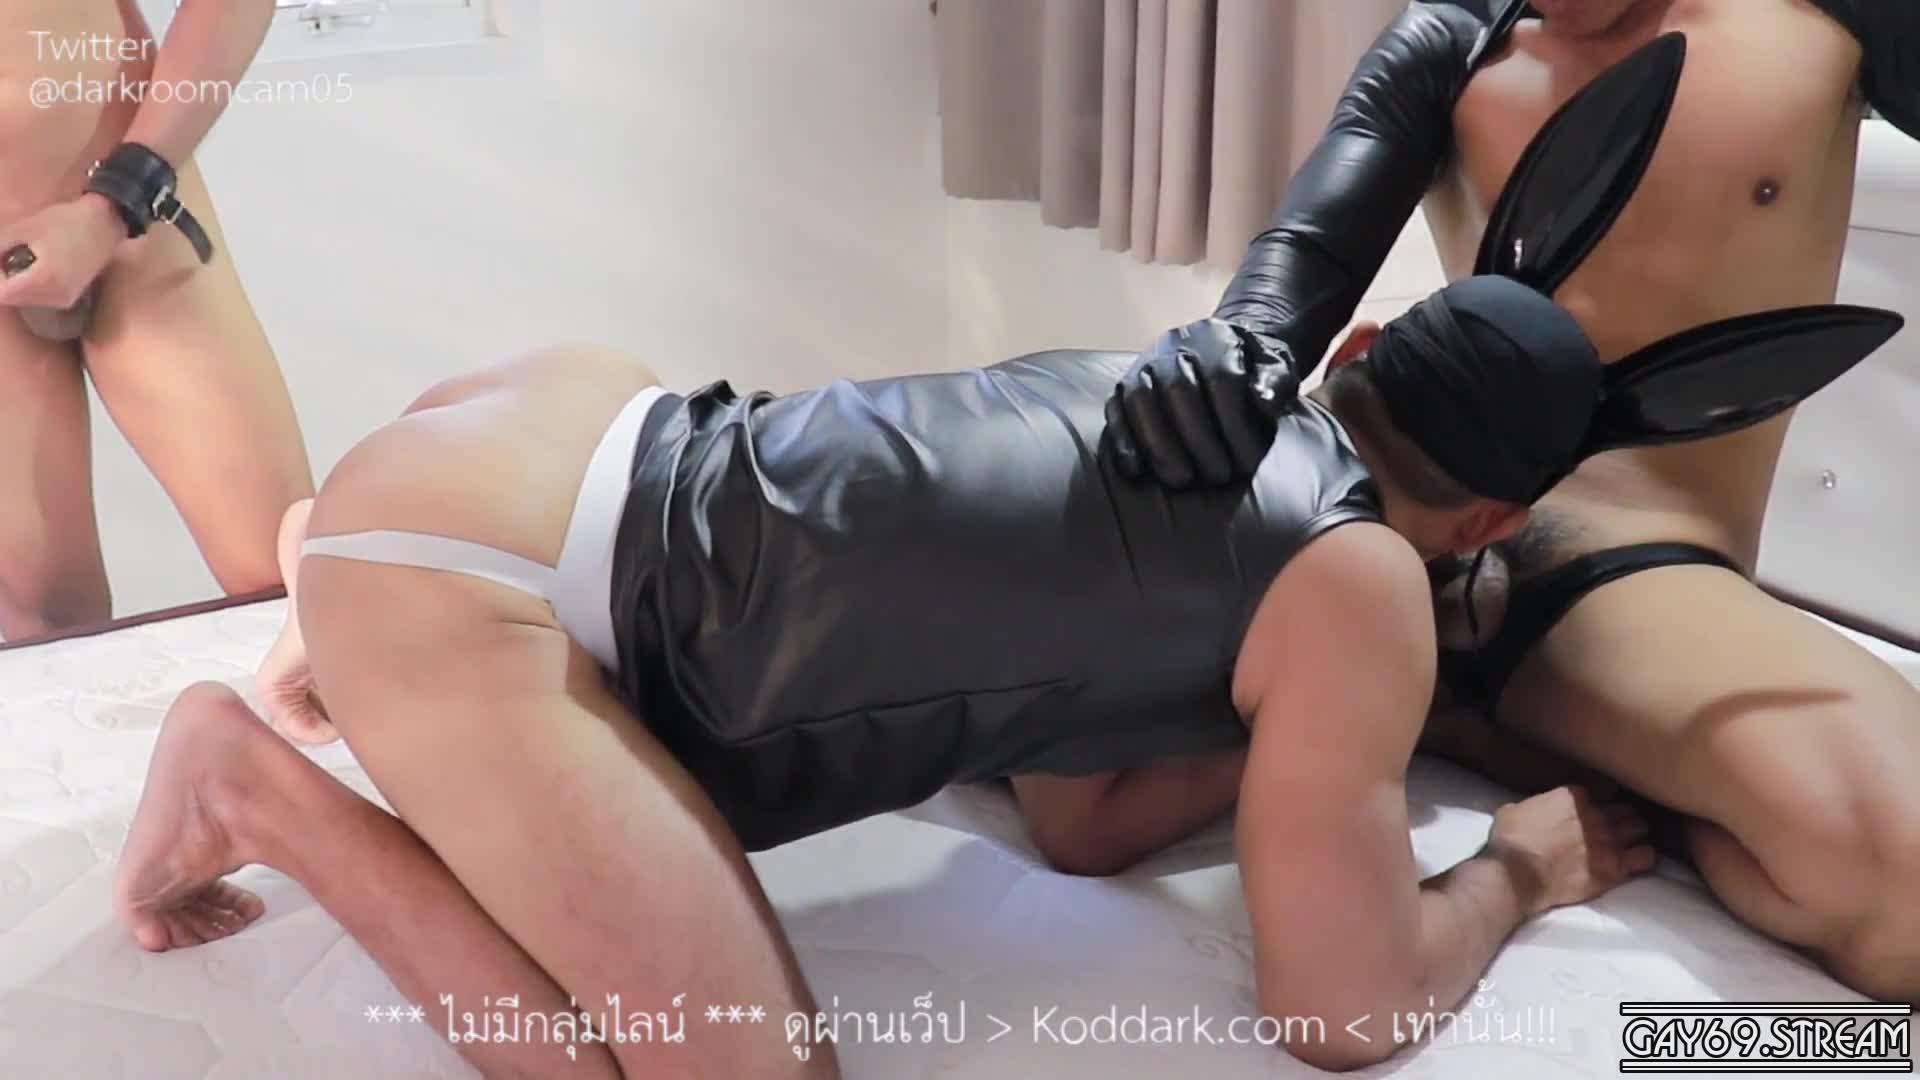 【HD】【OF】 Koddark 45_20210708